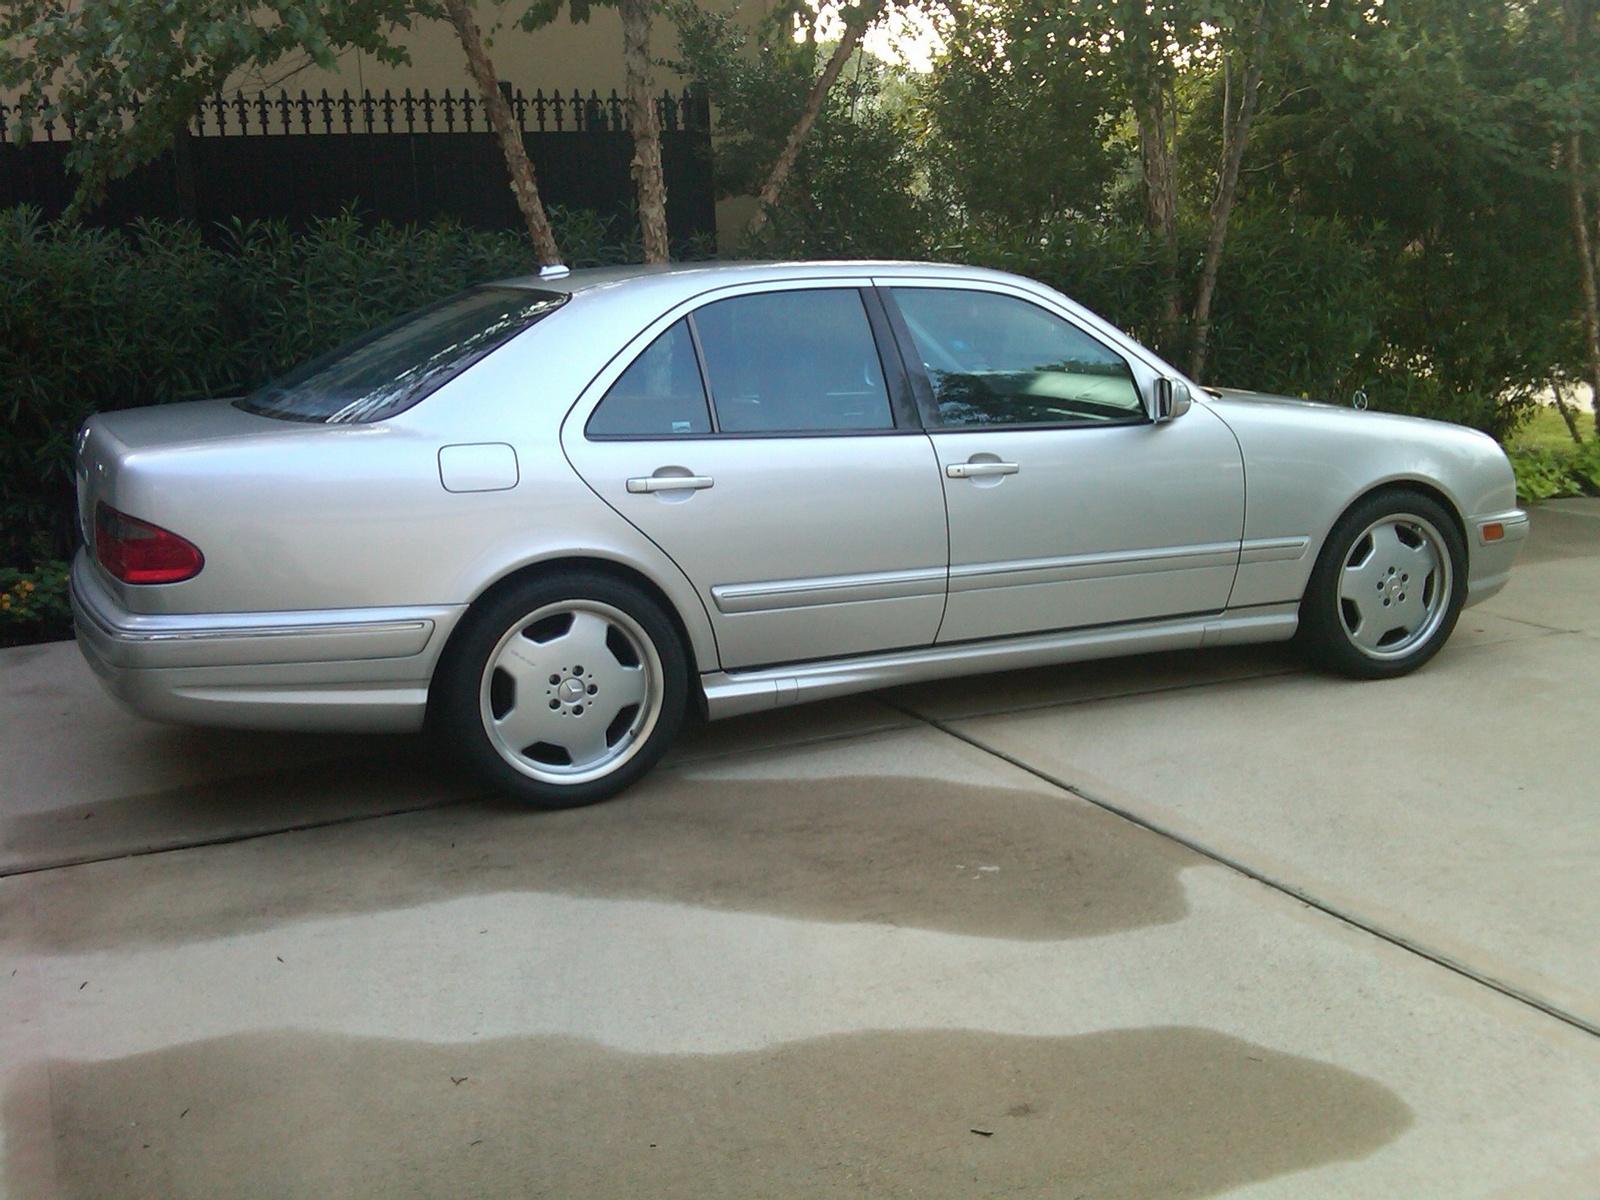 2002 Mercedes-Benz E-Class - Pictures - CarGurus